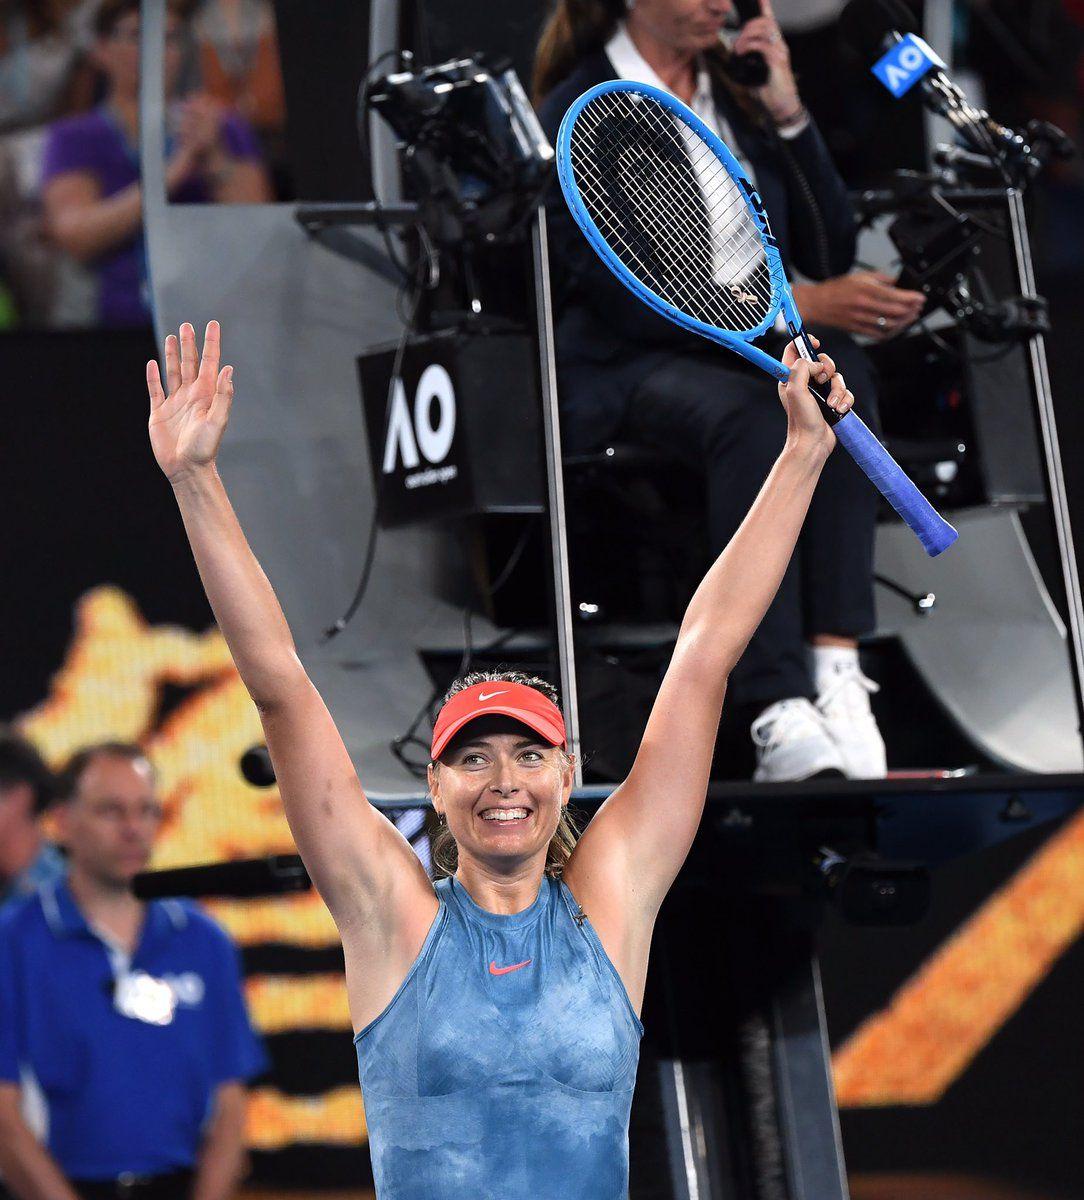 Porsche Tennis Porschetennis Twitter Tennis Clothes Maria Sharapova Tennis Players Female